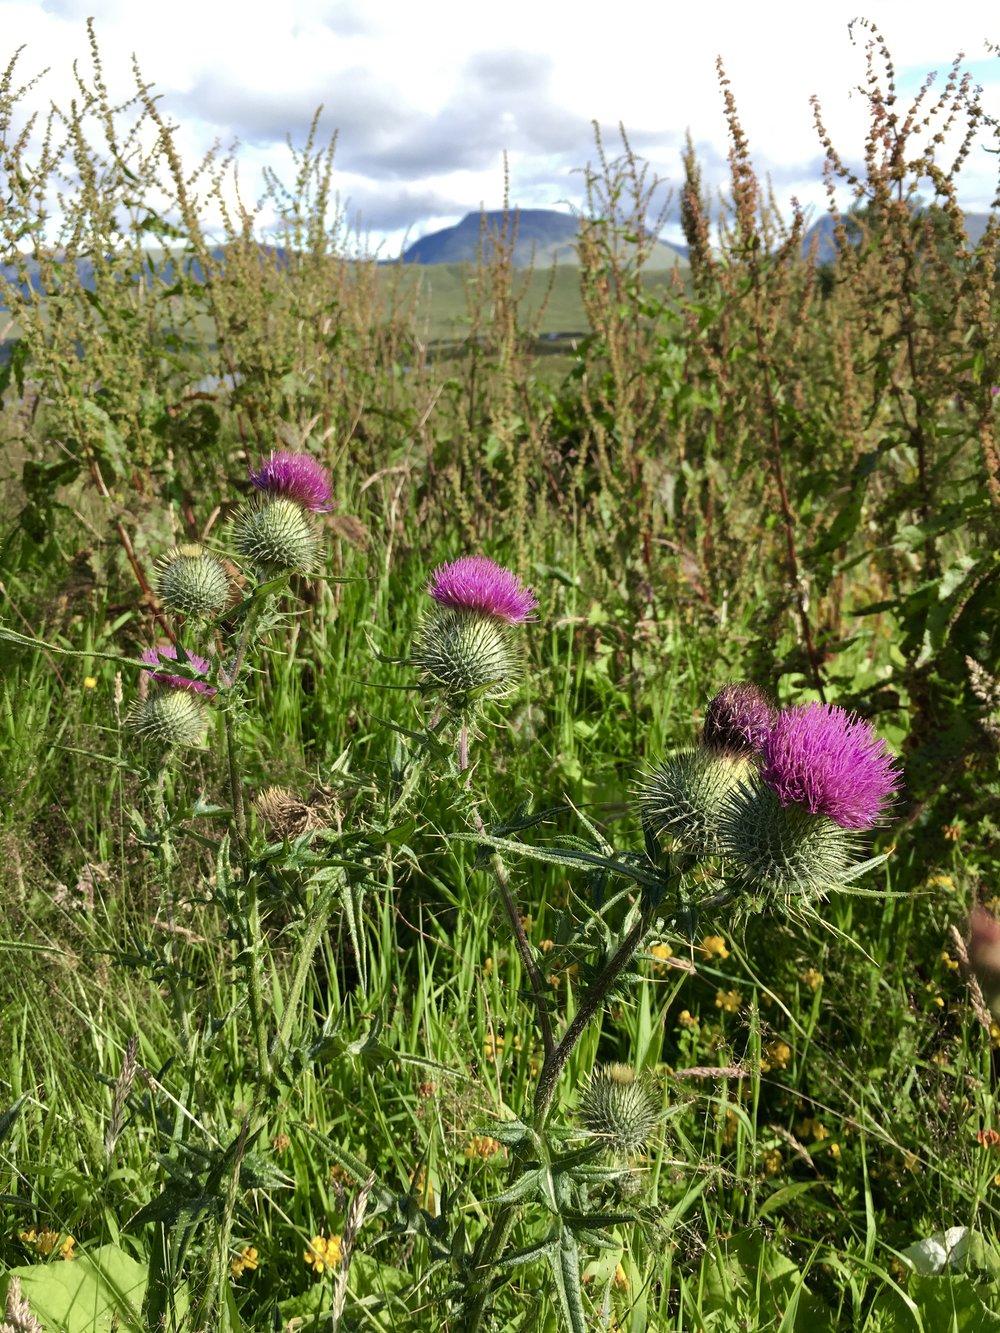 Thistle, national flower of Scotland